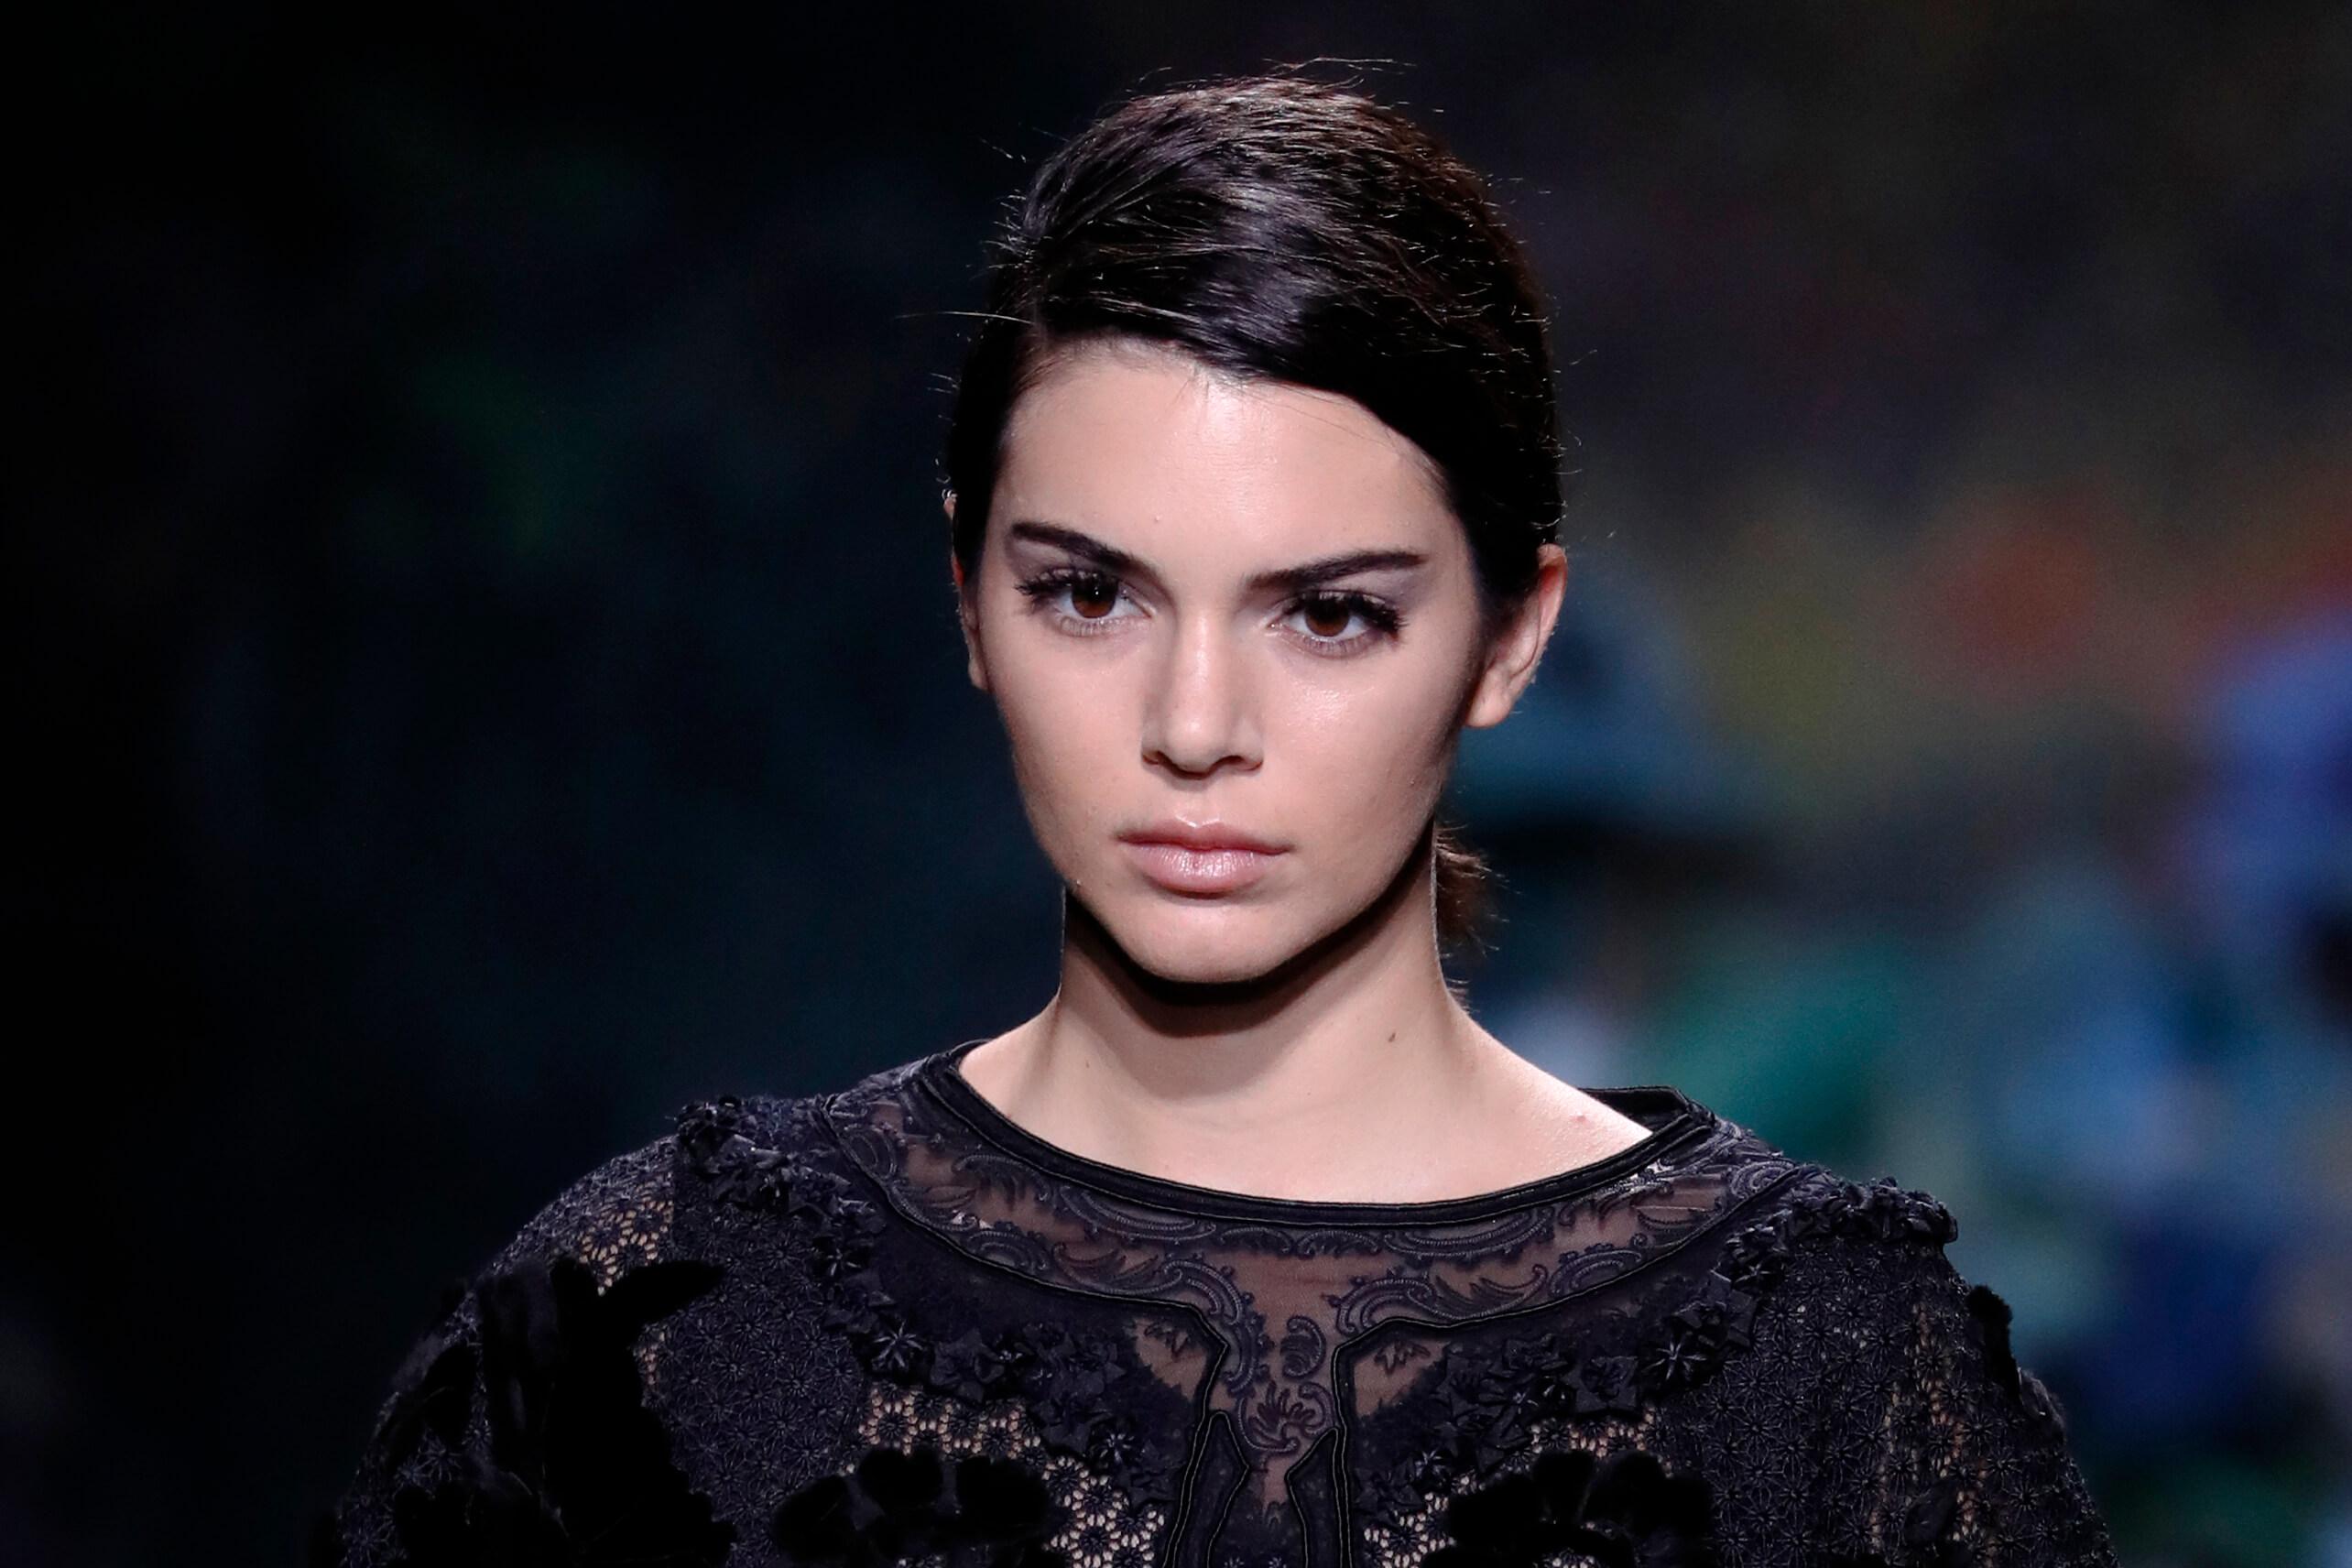 Kendall Jenner nombrada icono de la moda de la década